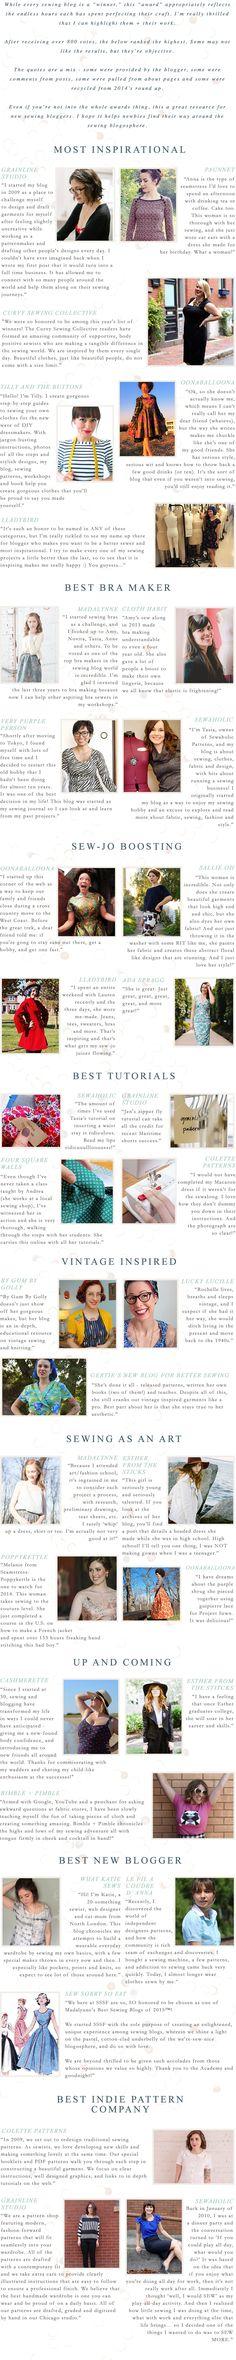 Best sewing blogs 2015 - Madalynne - A Sewing Blog